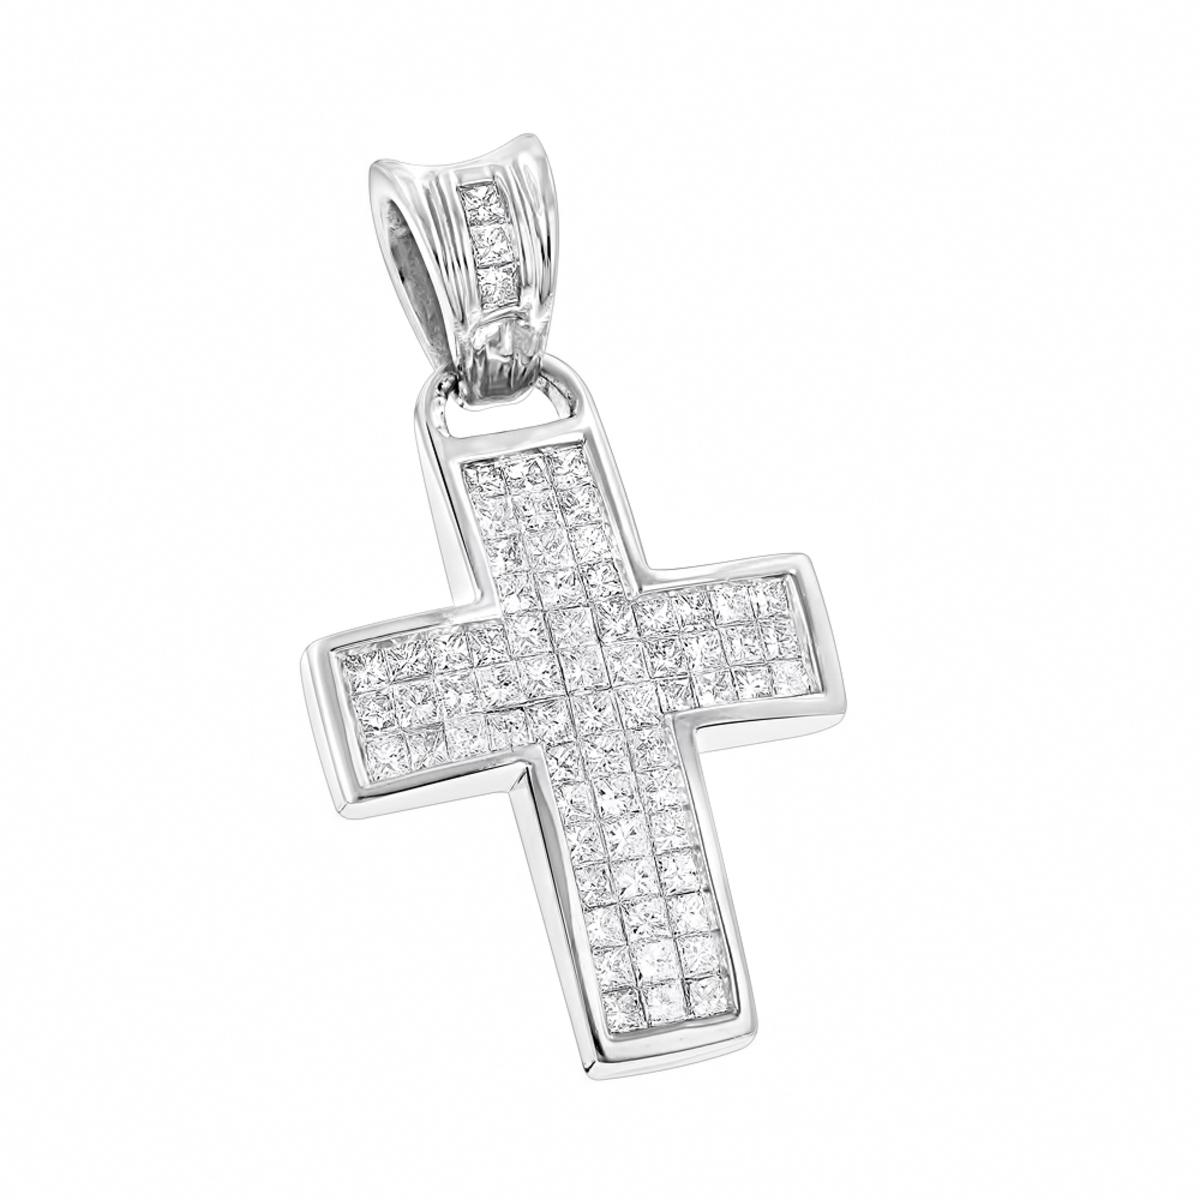 14K Gold Small Diamond Cross Pendant 1.1 ct